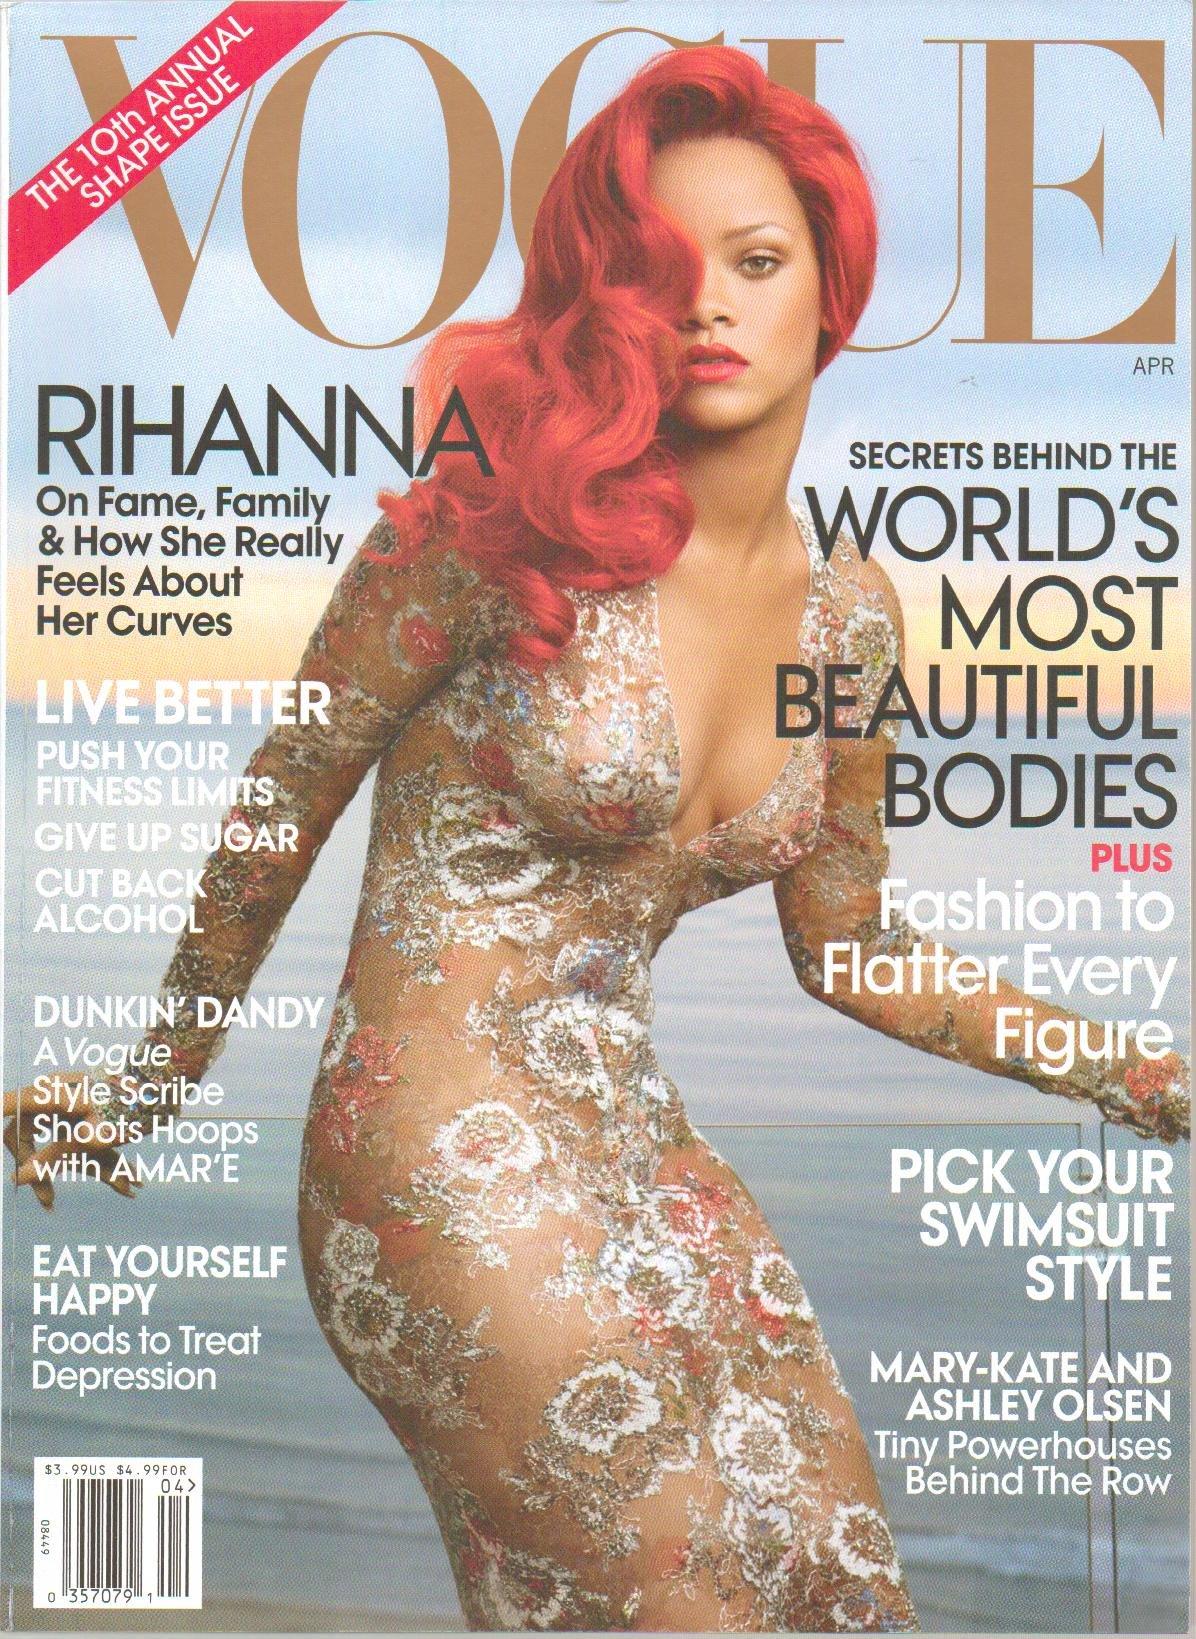 Vogue Magazine, April 2011 - 10th Annual Shape Issue, Rihanna on Fame Family - Secrets Behine the World's Most Beautiful Bodies, Mary-kate and Ashley Olsen Tiny Powerhouses Behine the Row pdf epub